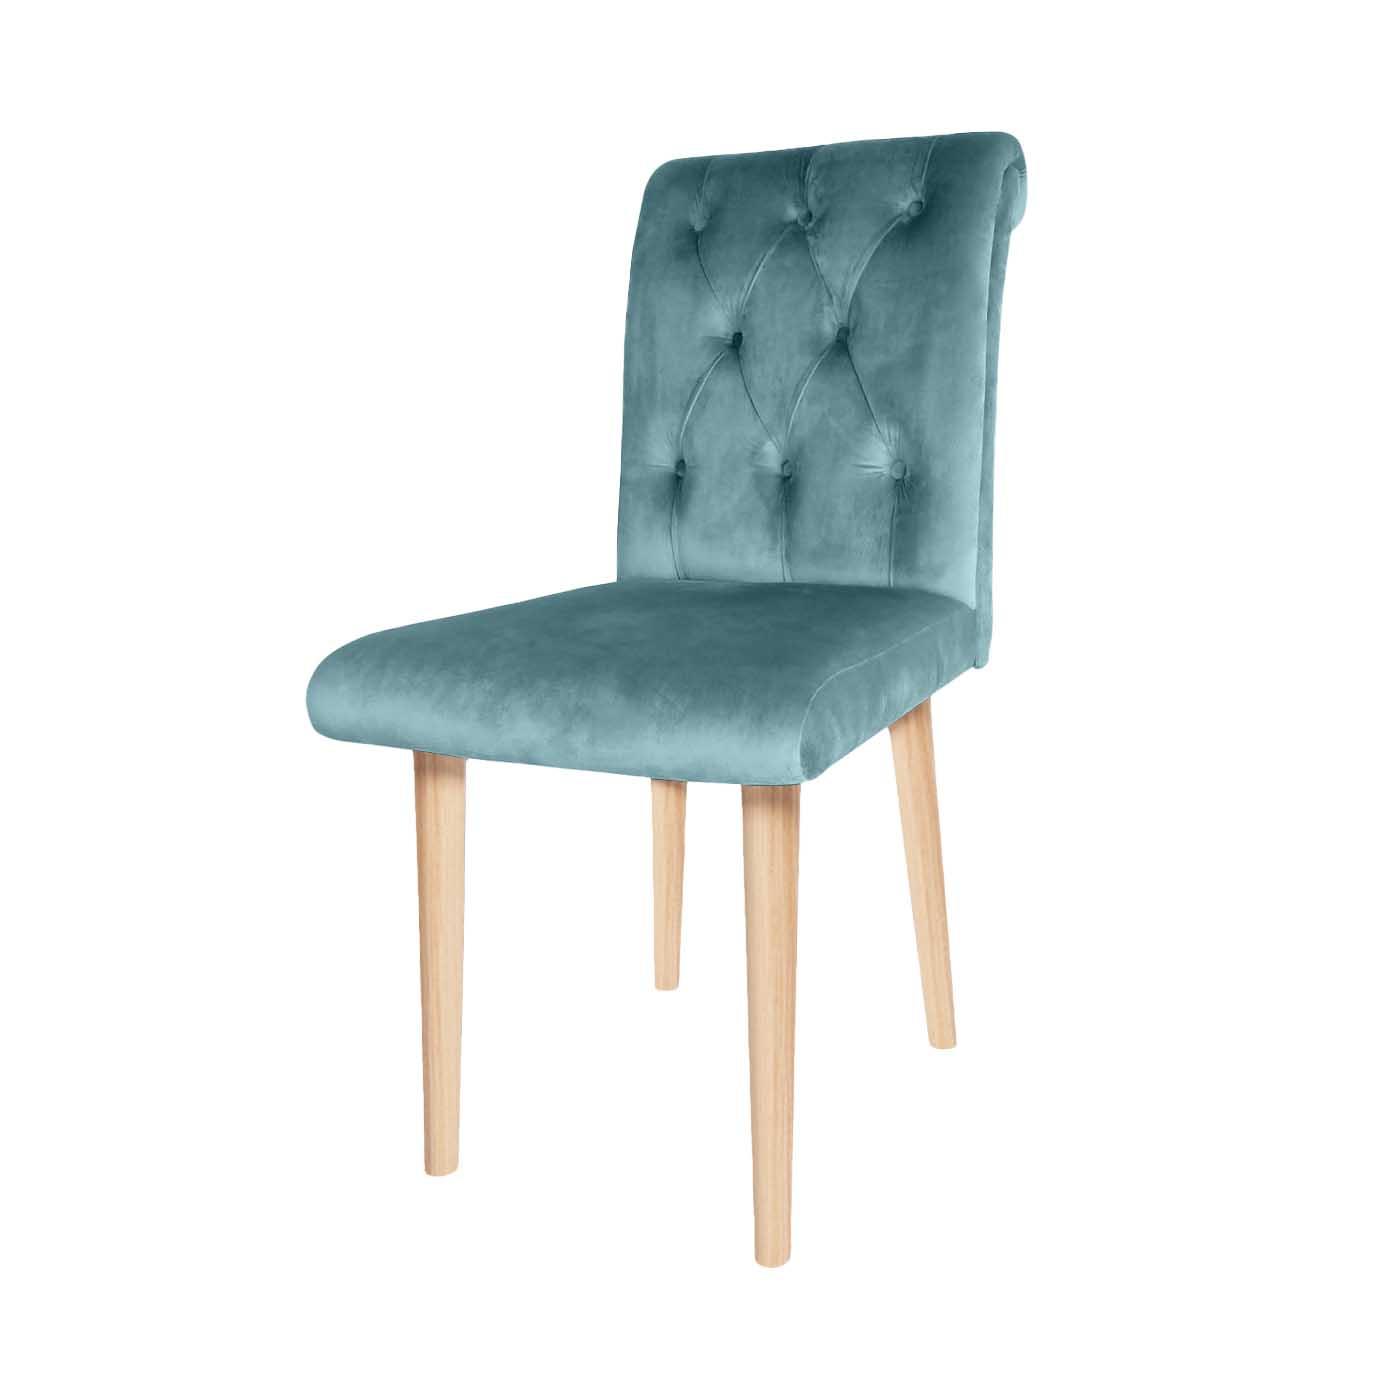 Chesterfield Aqua Green Stitch Light Dining Chair